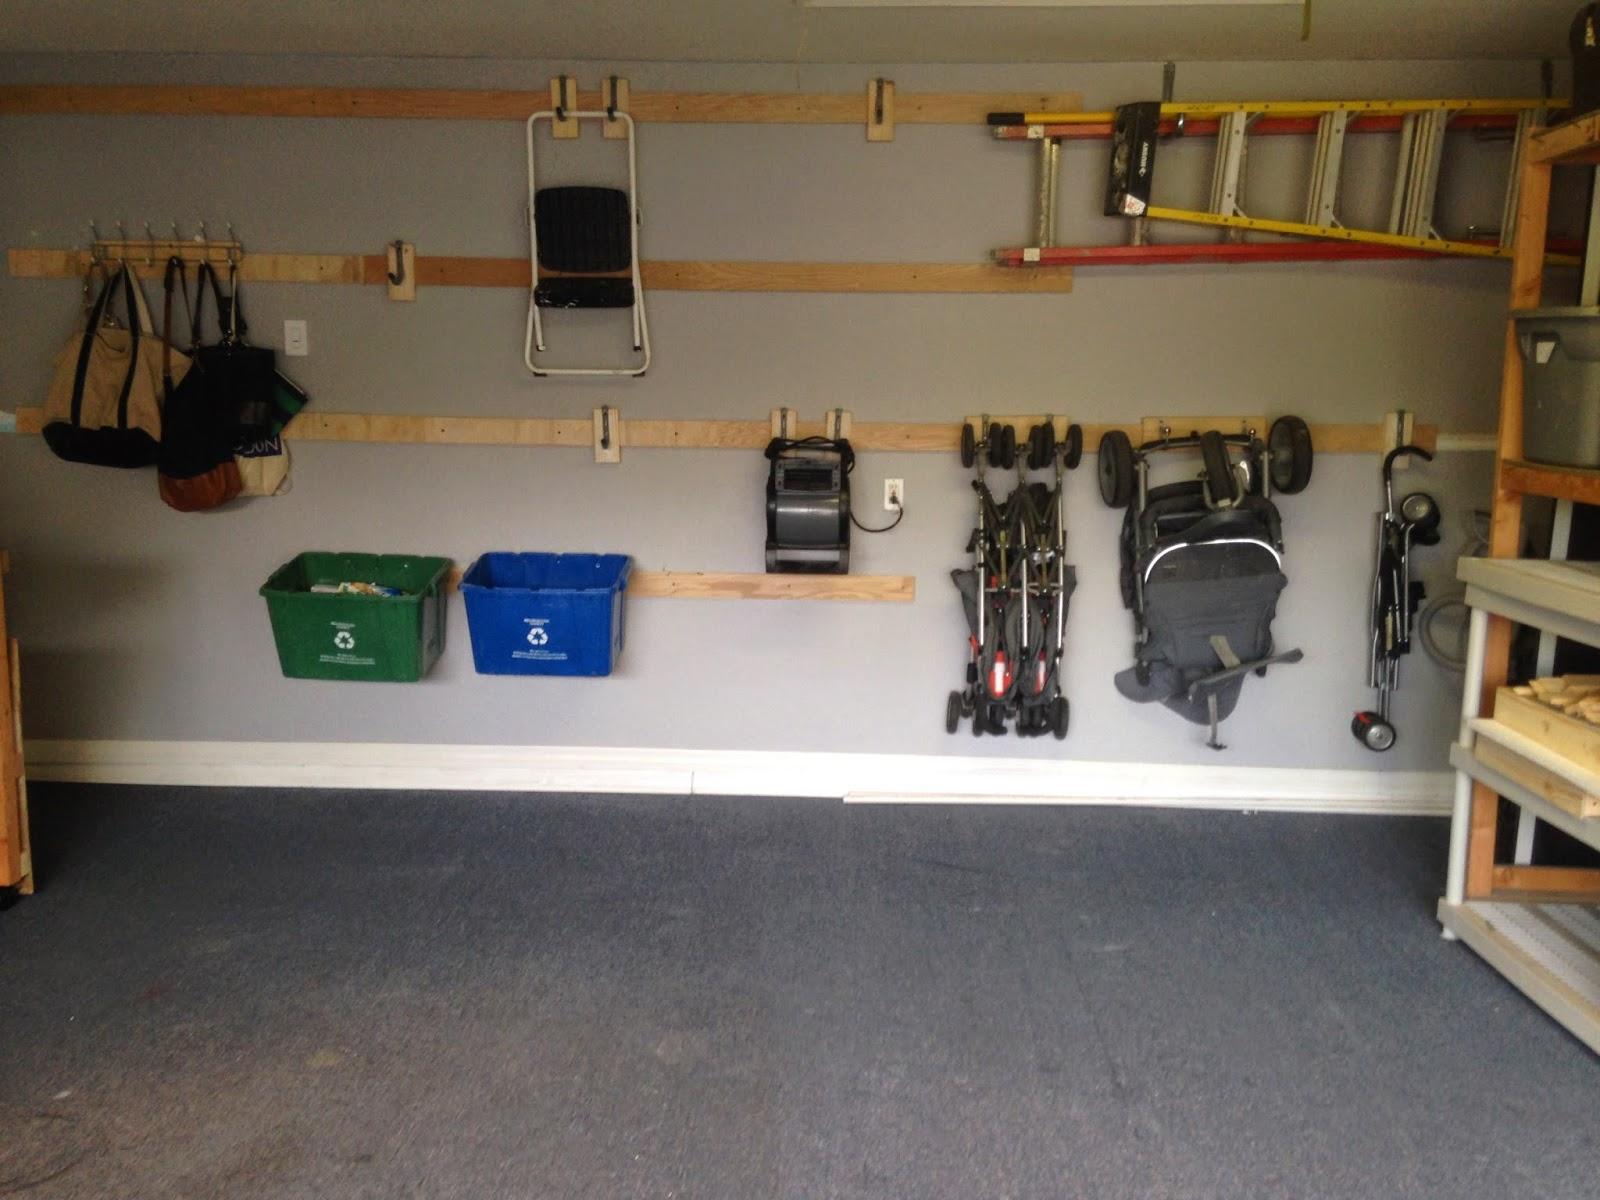 http://sewingandsanding.blogspot.com/2014/04/garage-storage.html